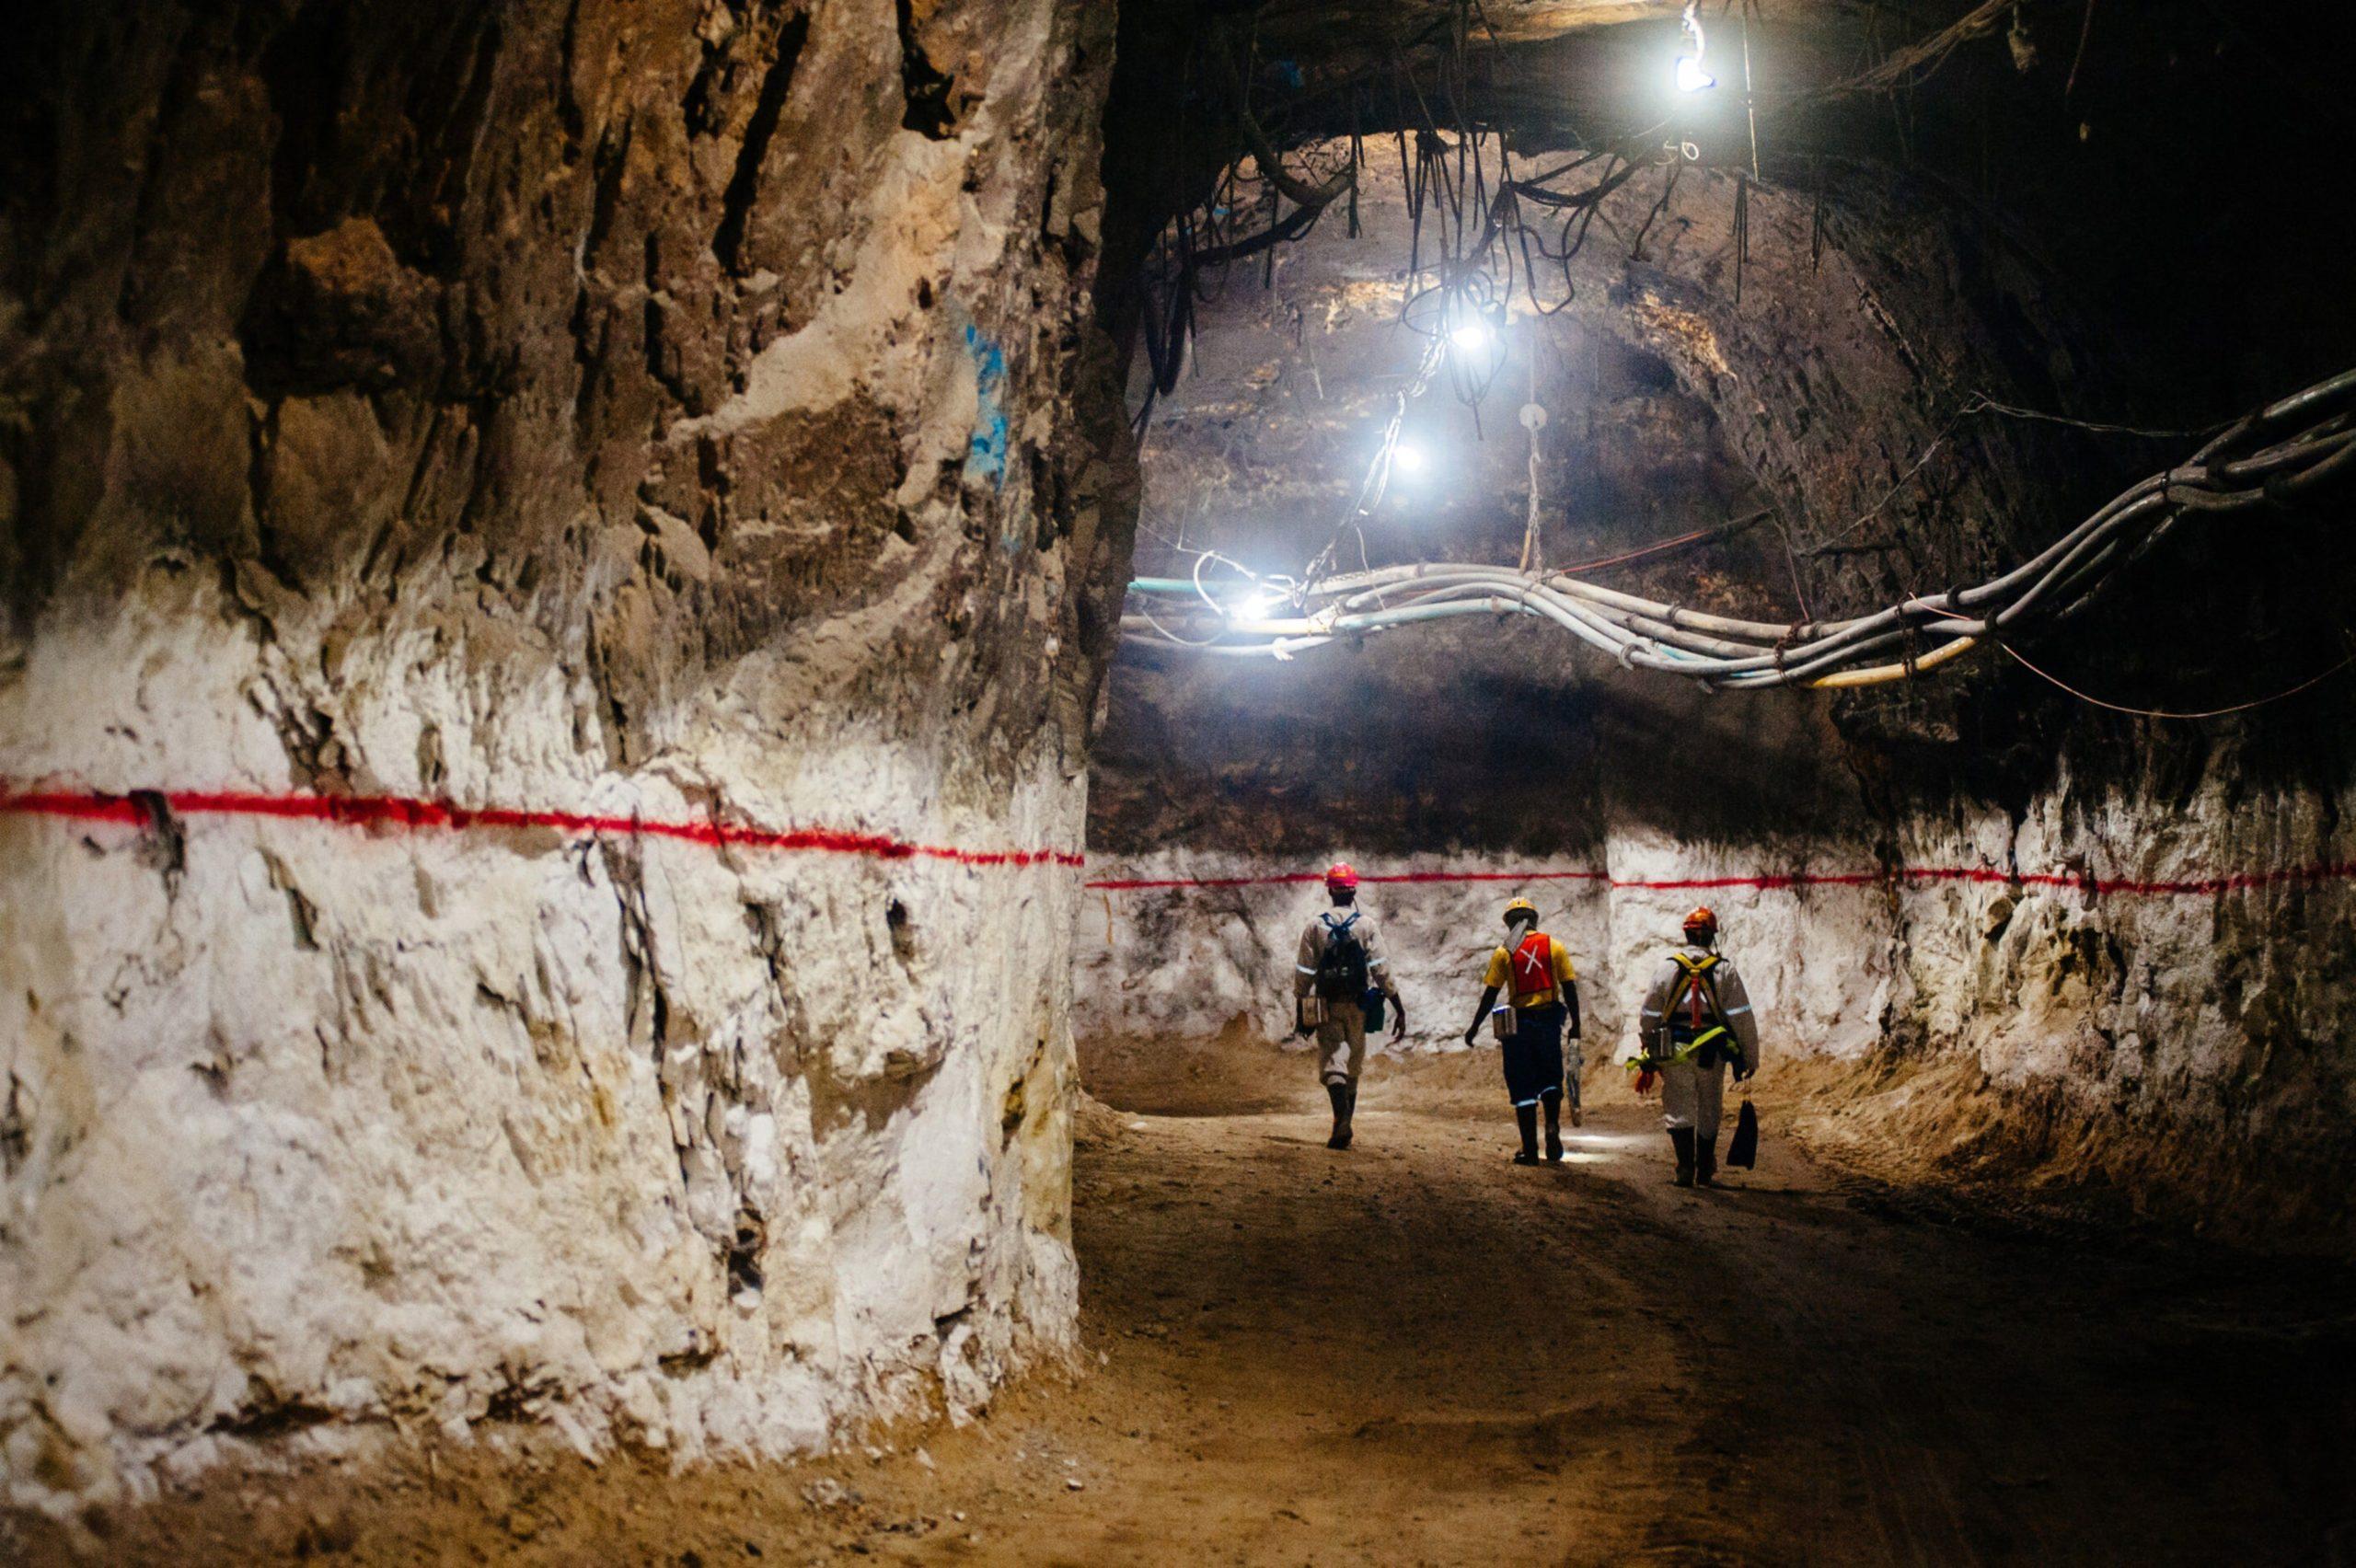 dailymaverick.co.za - Bloomberg - Business Maverick: With Gold Rallying, Mining CEOs Say ESG Scrutiny Is Intensifying